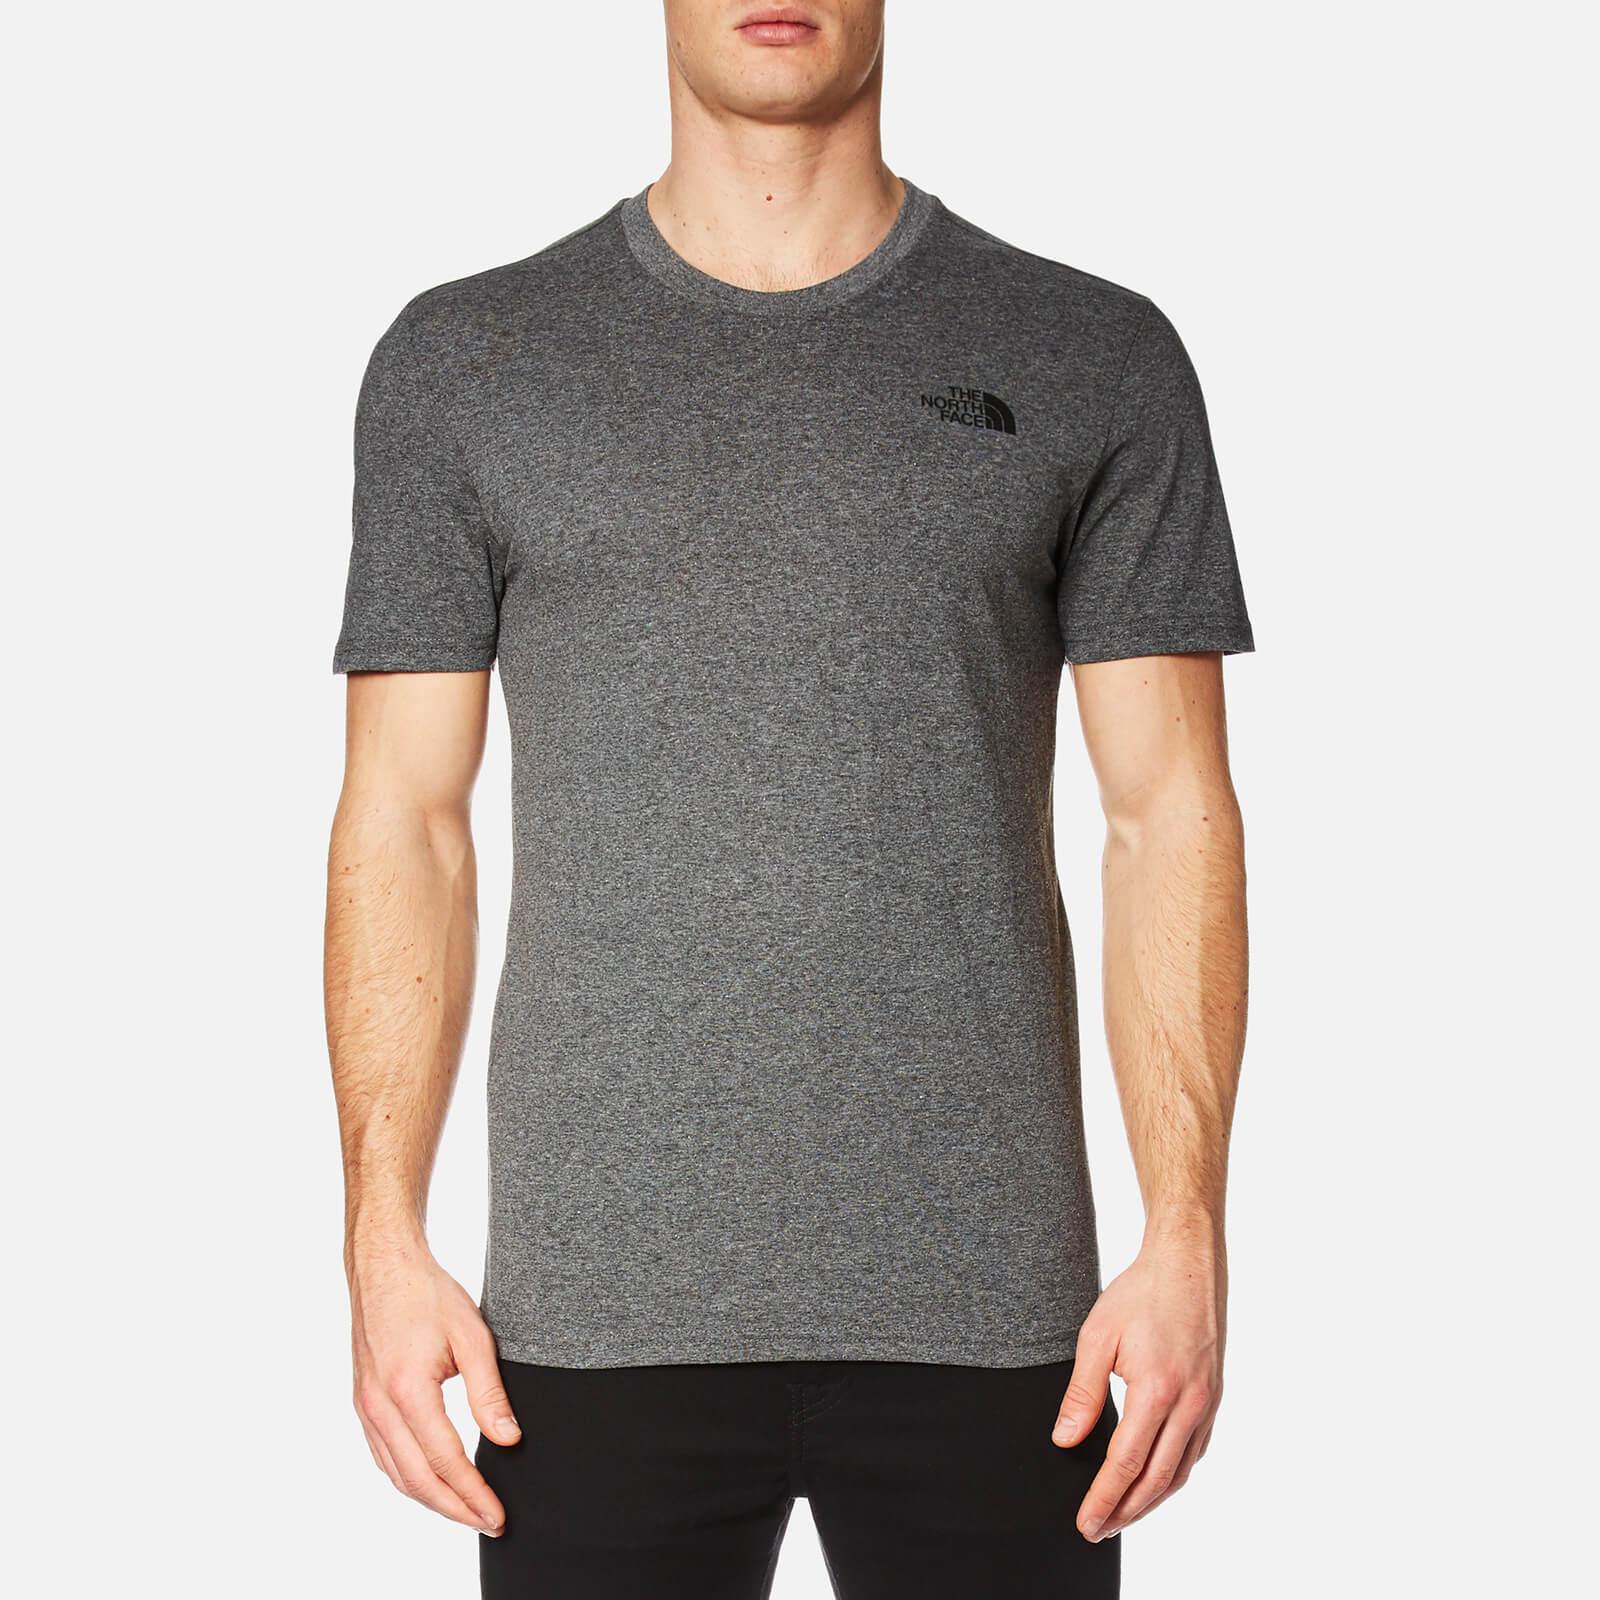 The North Face Men's Simple Dome Short Sleeve T-Shirt - TNF Medium Grey Heather - S